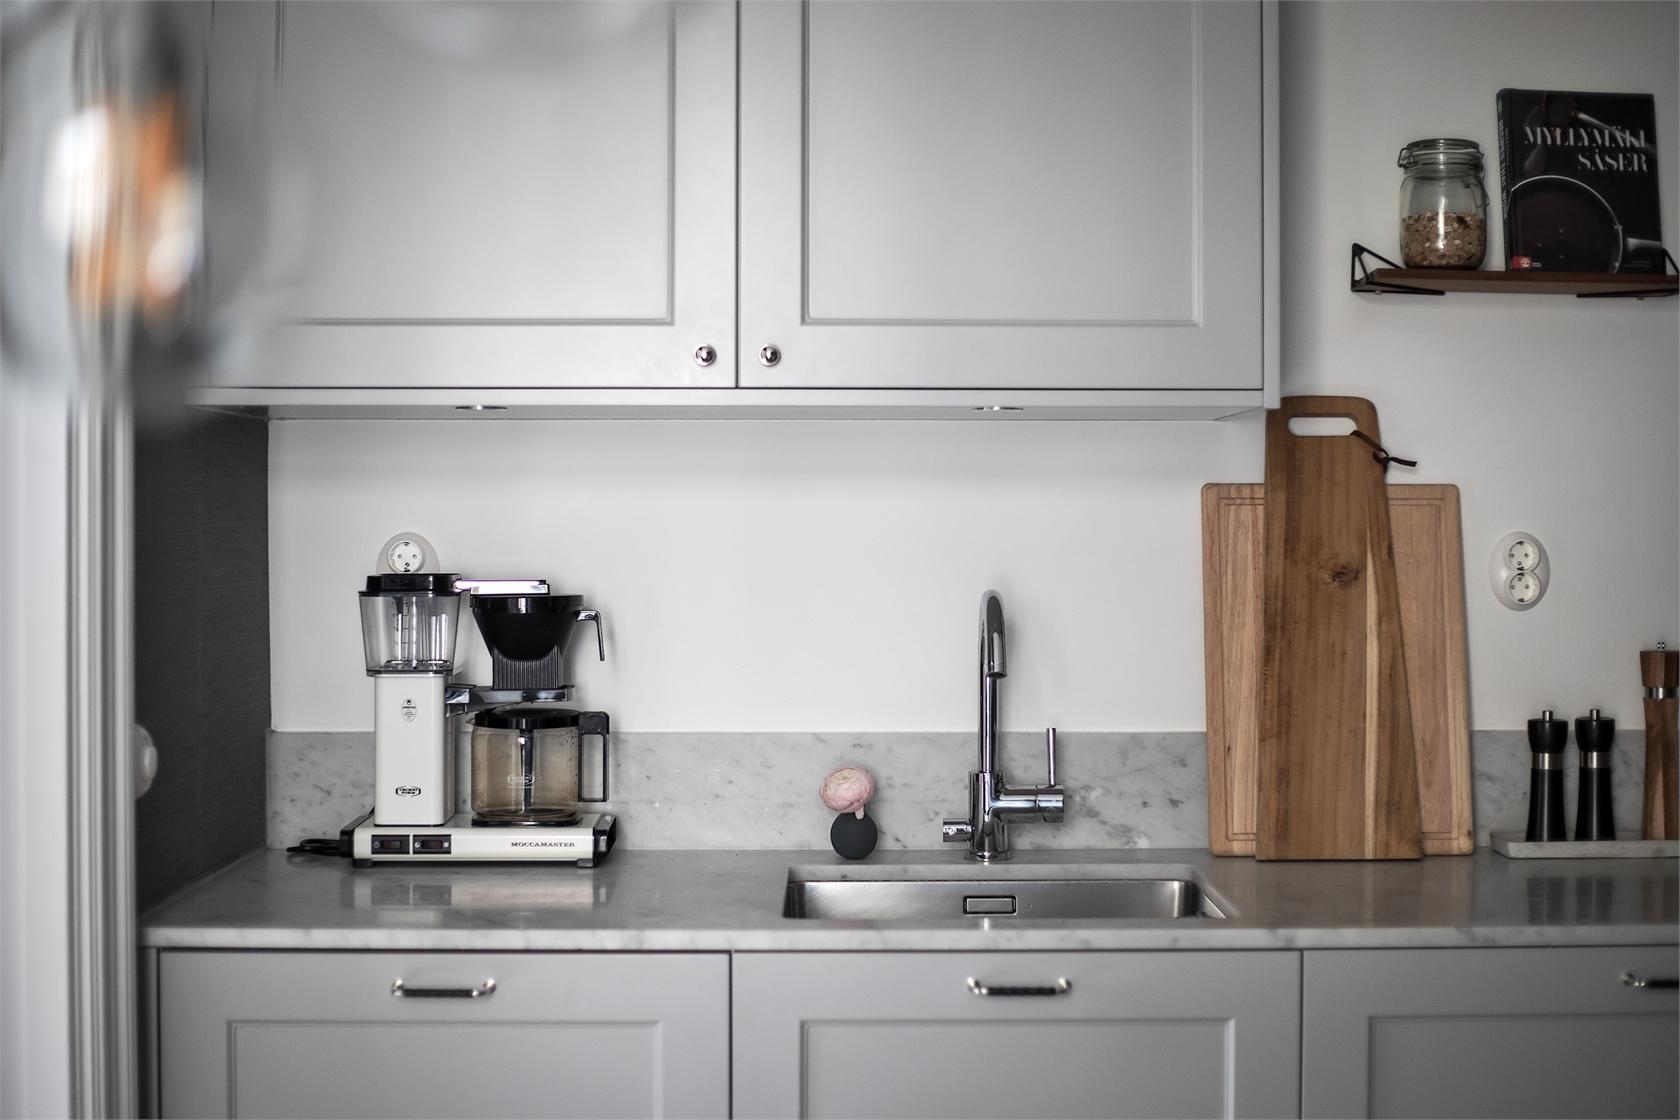 28606 kitchen countertop